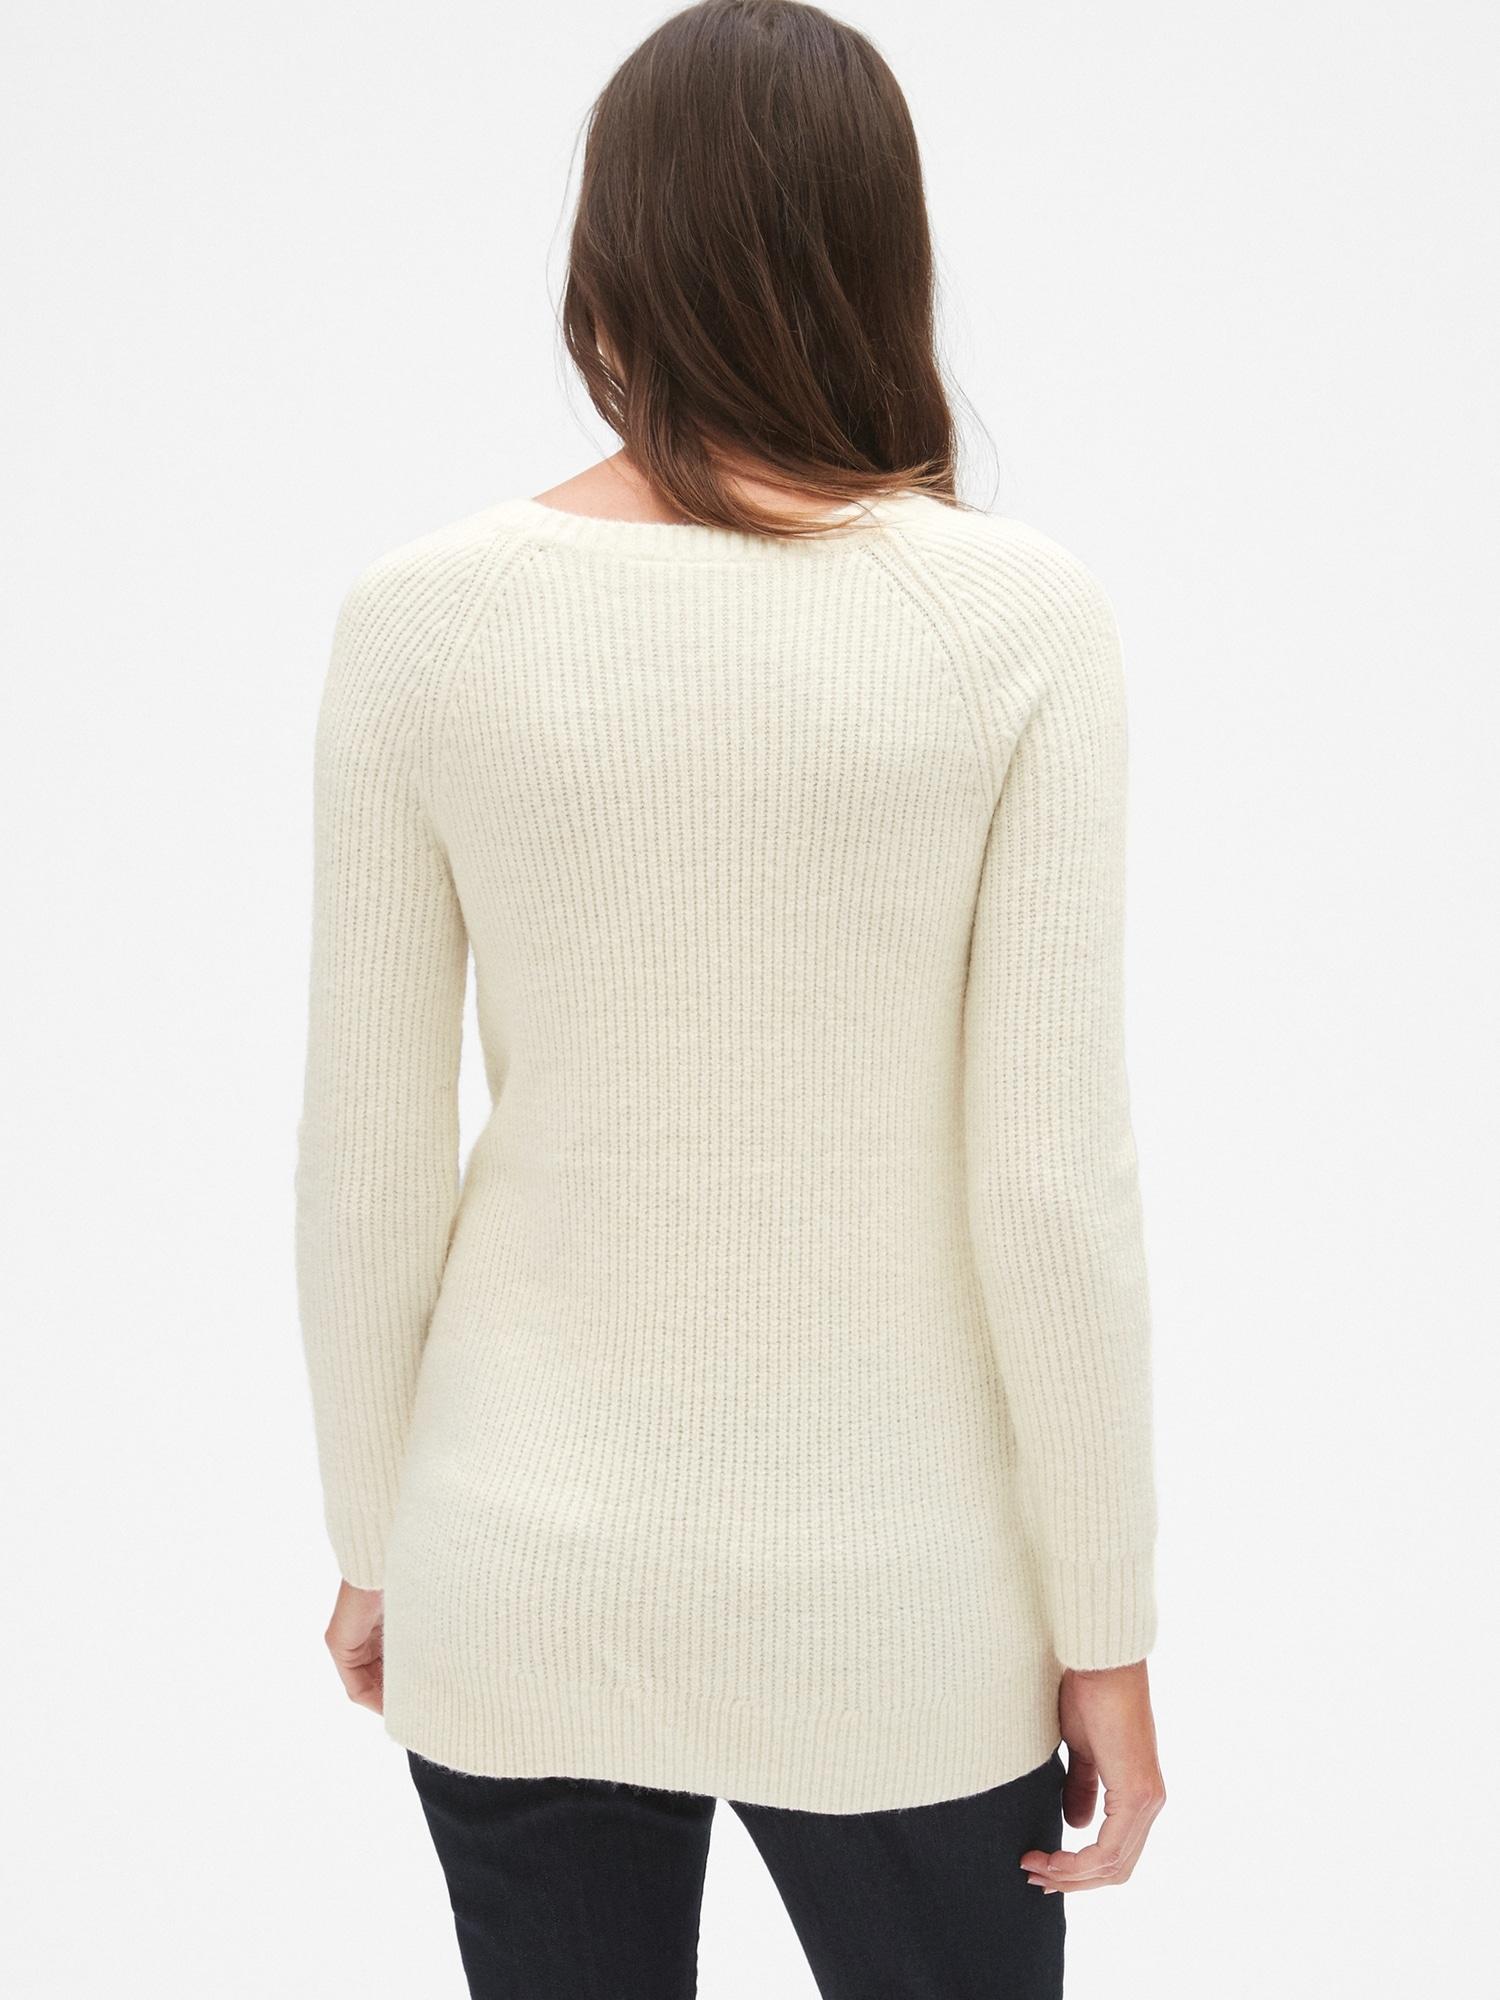 a17313a0f Maternity Side Lace-Up Sweater Tunic